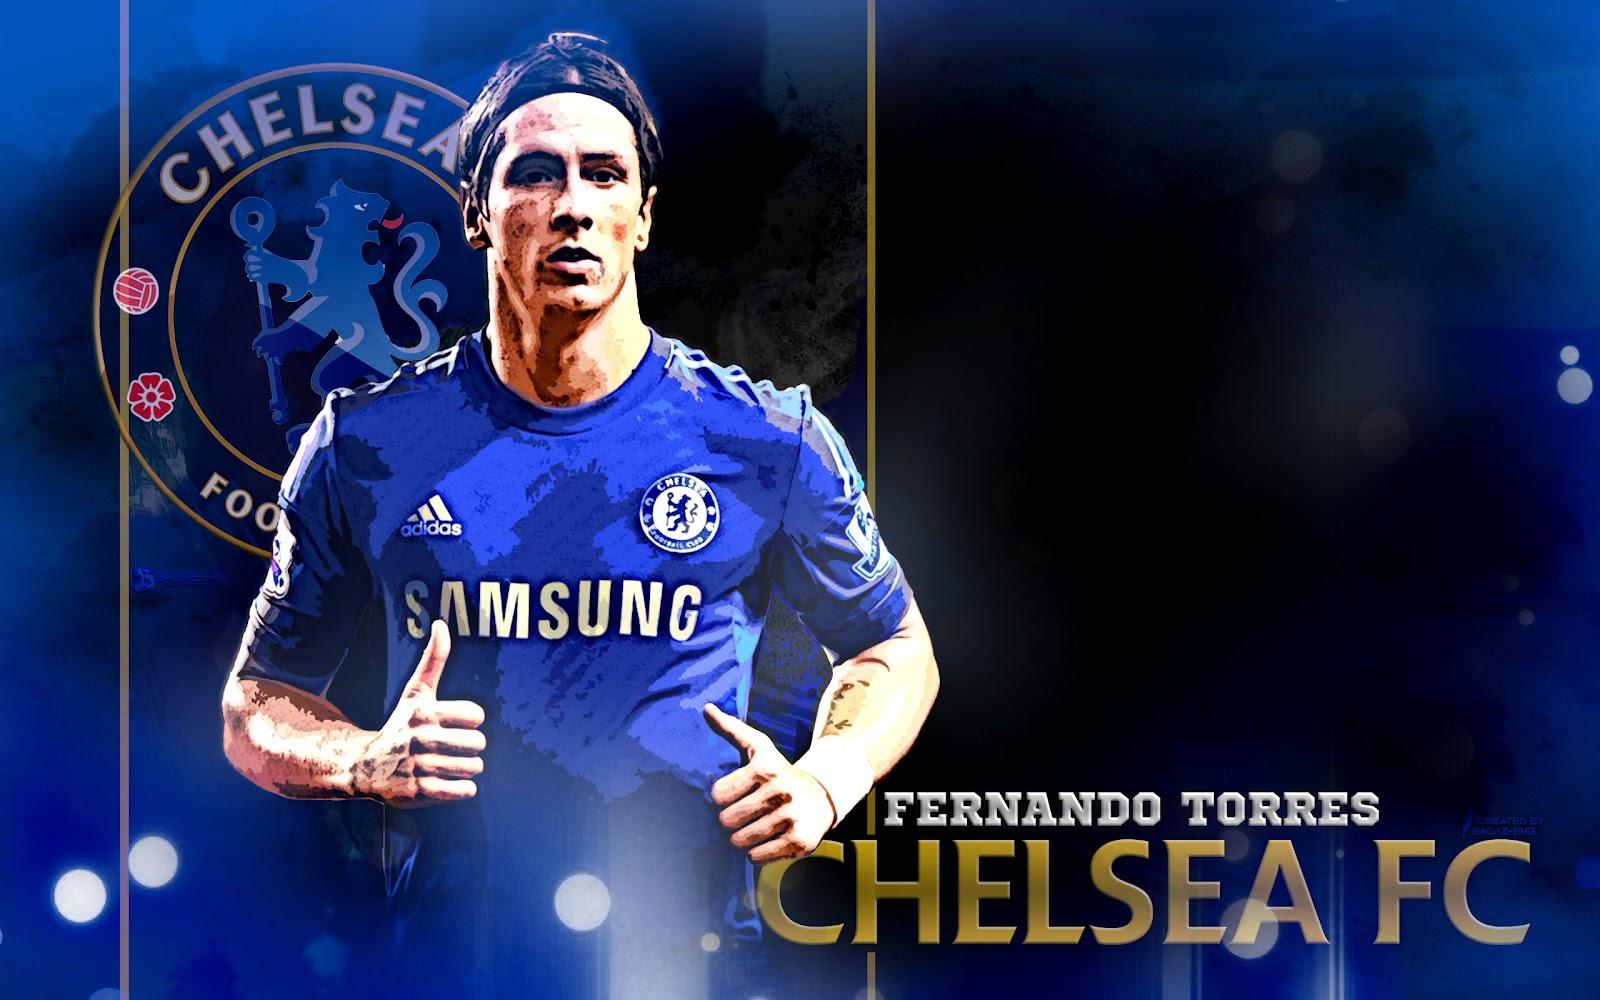 Wallpapers Hd For Mac: Fernando Torres Chelsea Wallpaper